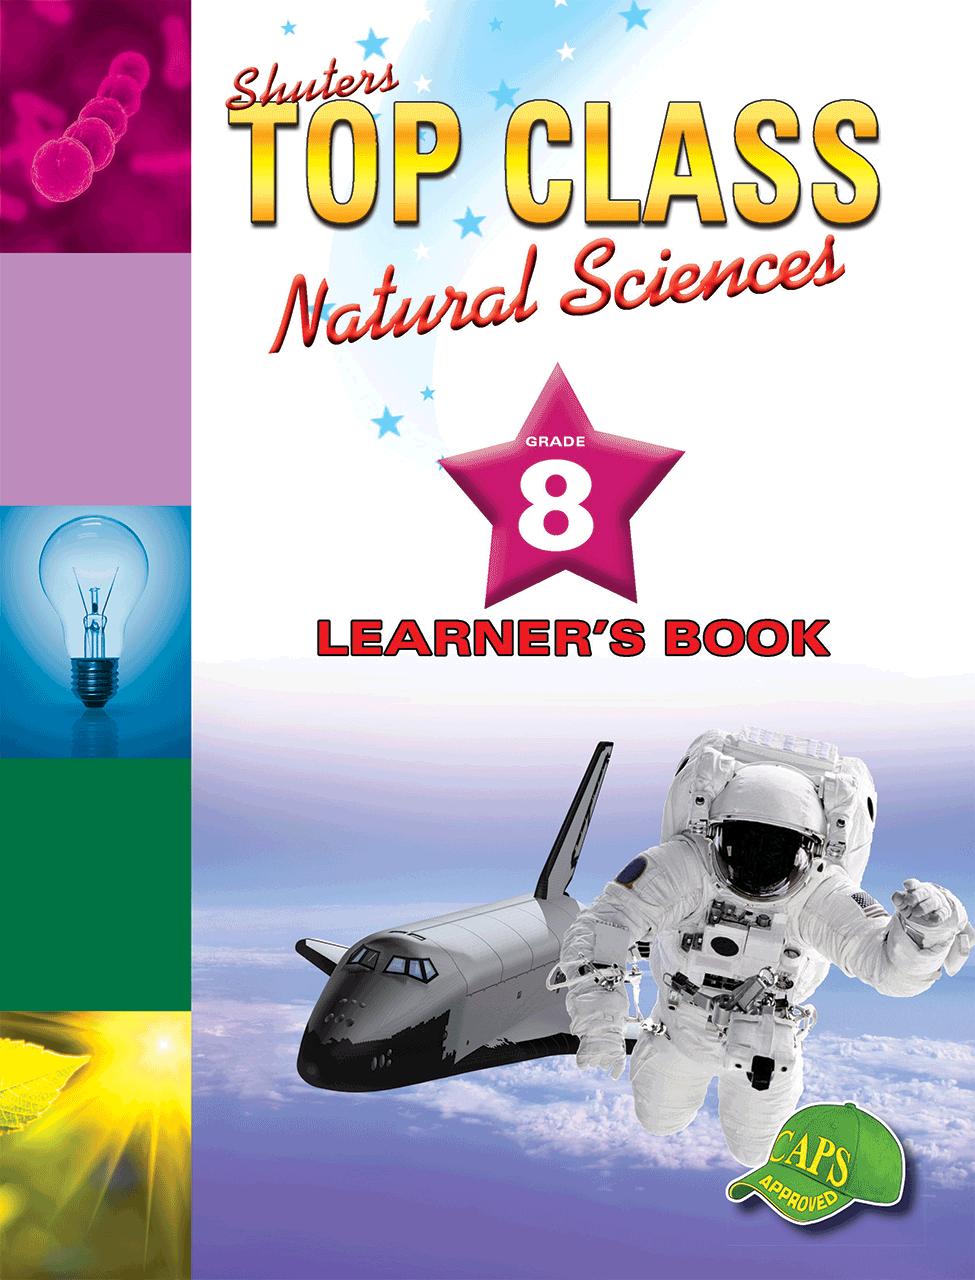 medium resolution of TOP CLASS NATURAL SCIENCES GRADE 8 LEARNER'S BOOK   WCED ePortal